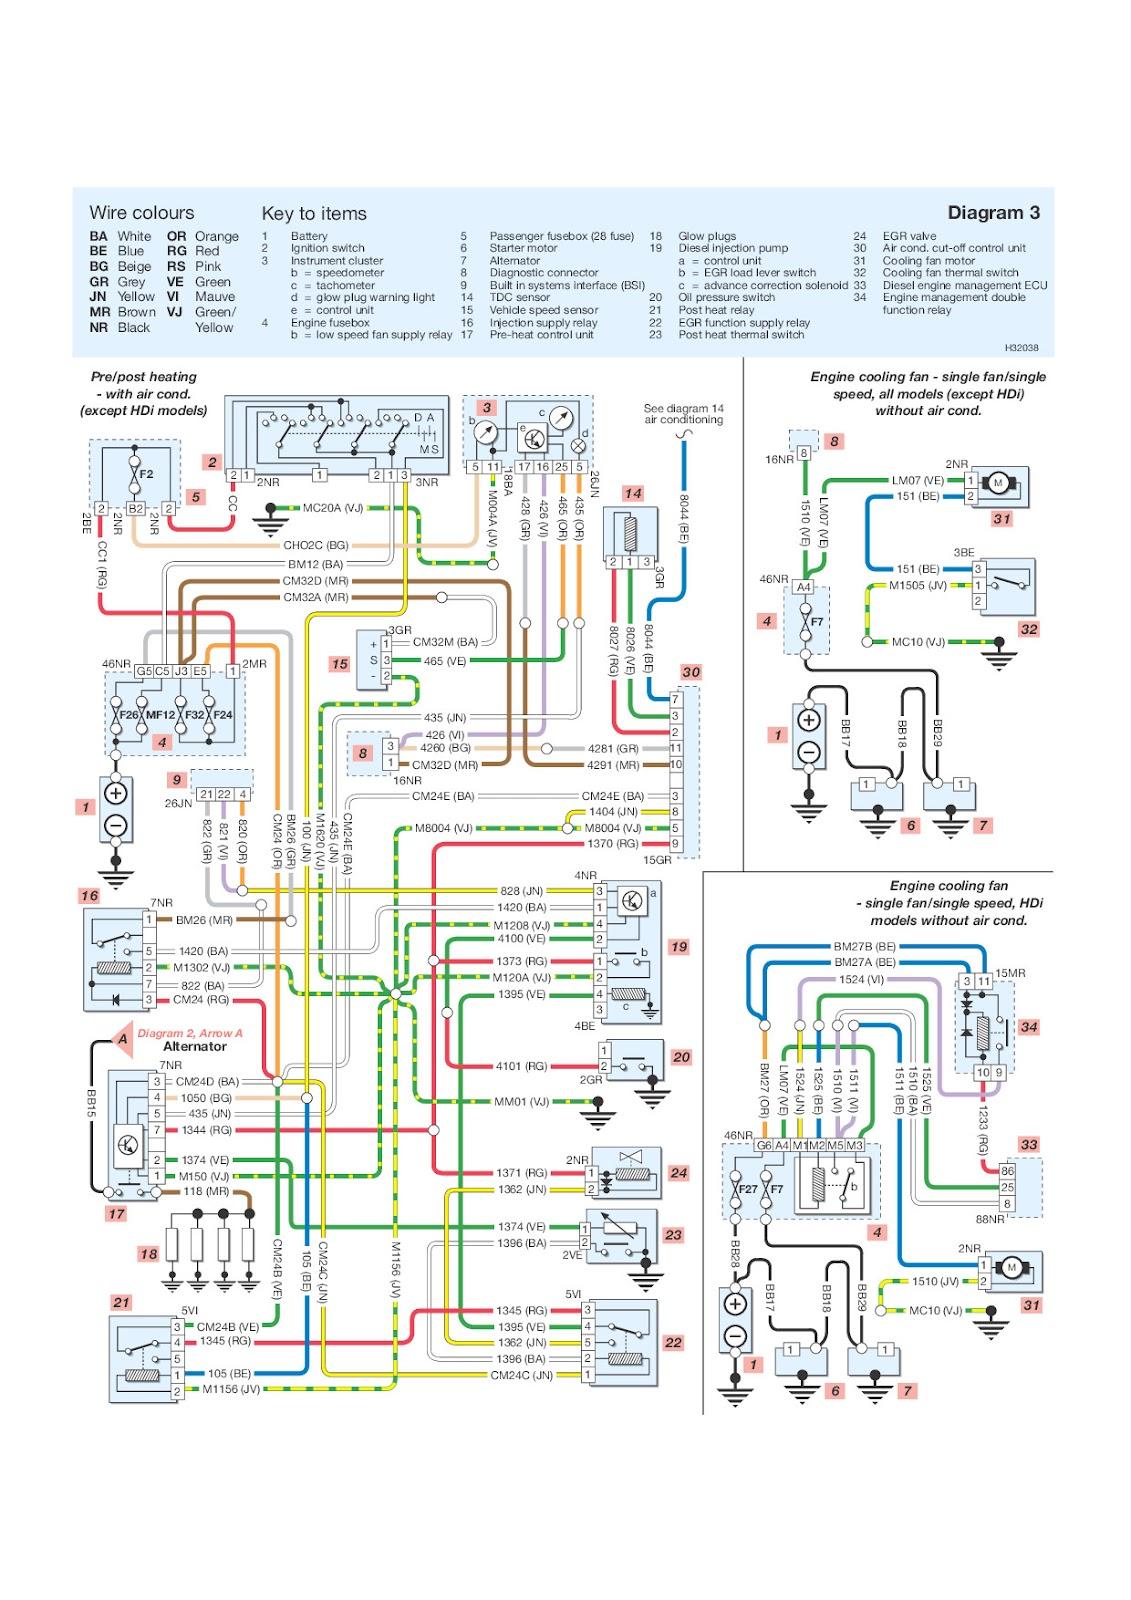 peugeot 206 wiring diagram mk4 golf towbar your diagrams source pre post heating